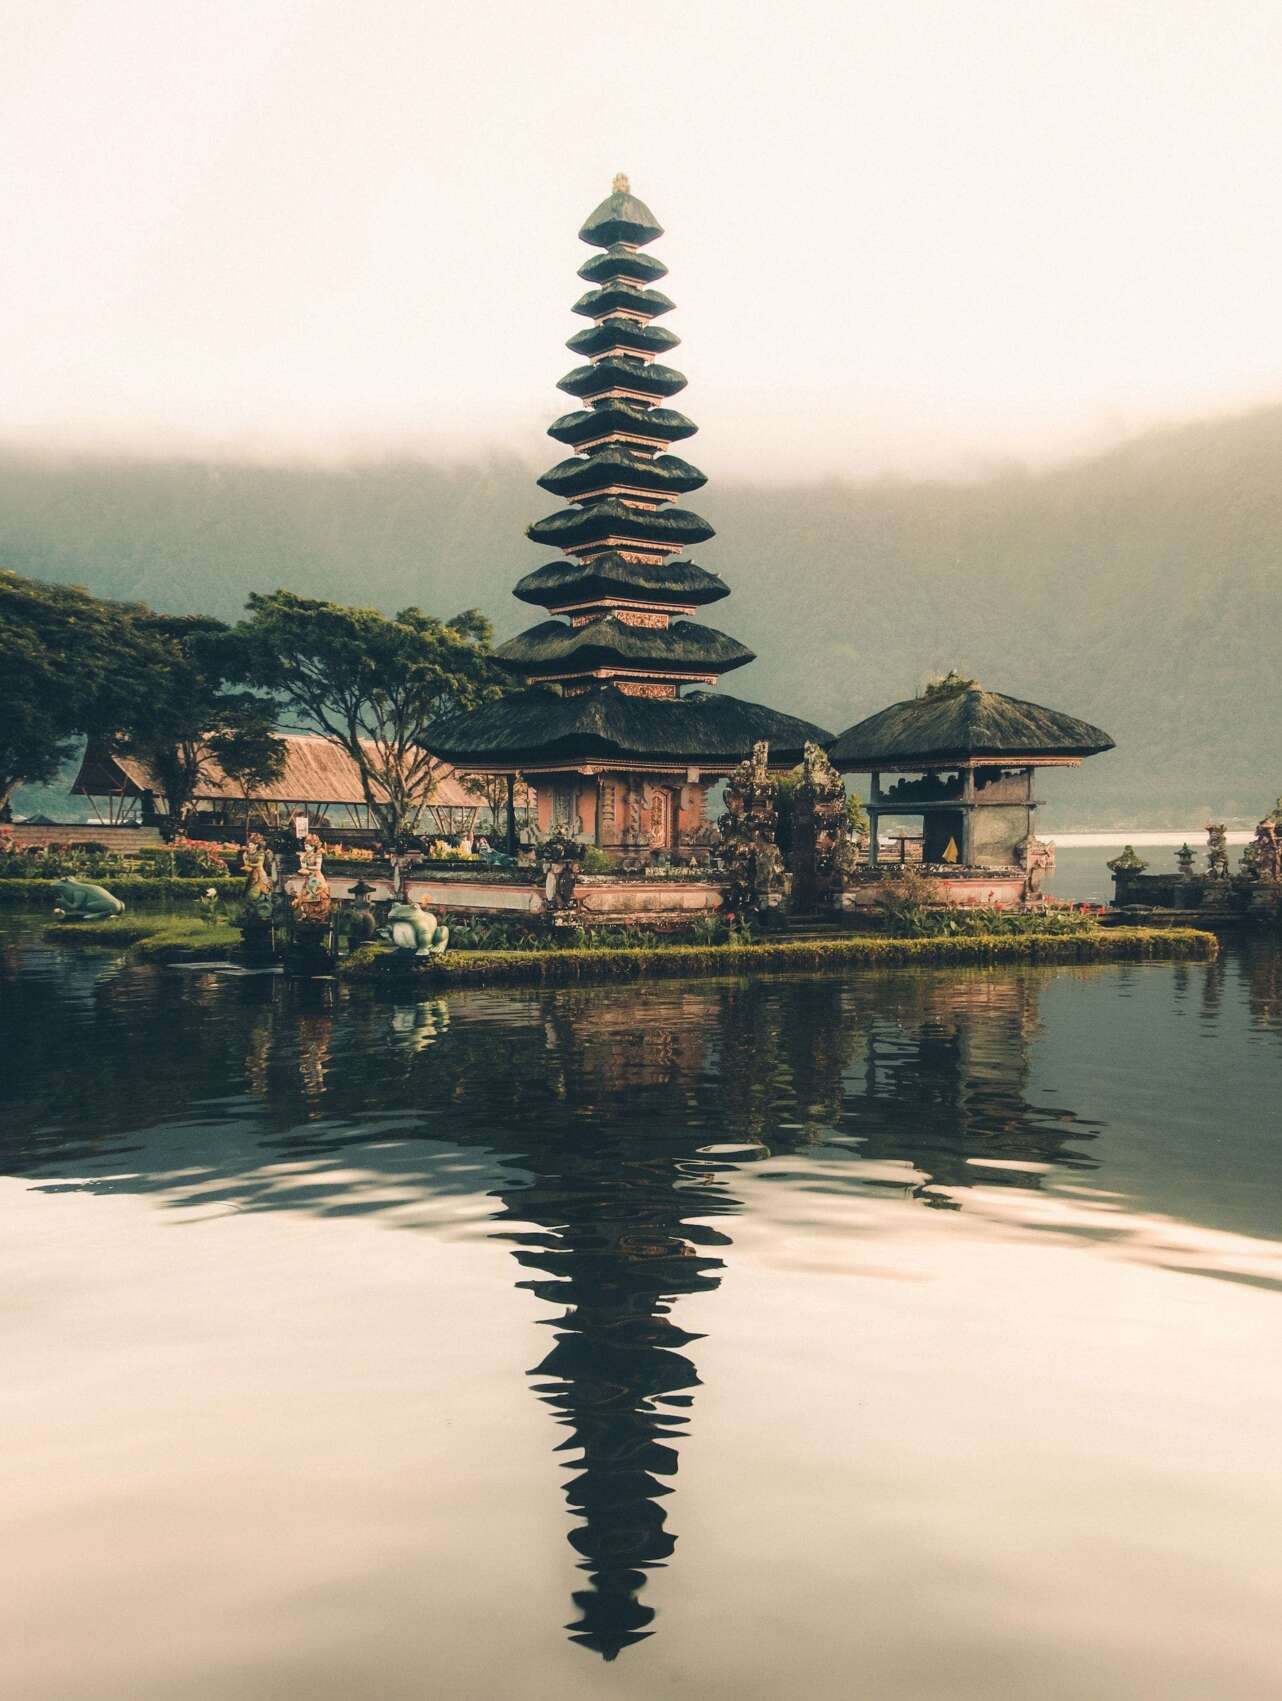 Bali, Indonesia. Foto Aron Visuals Unsplash